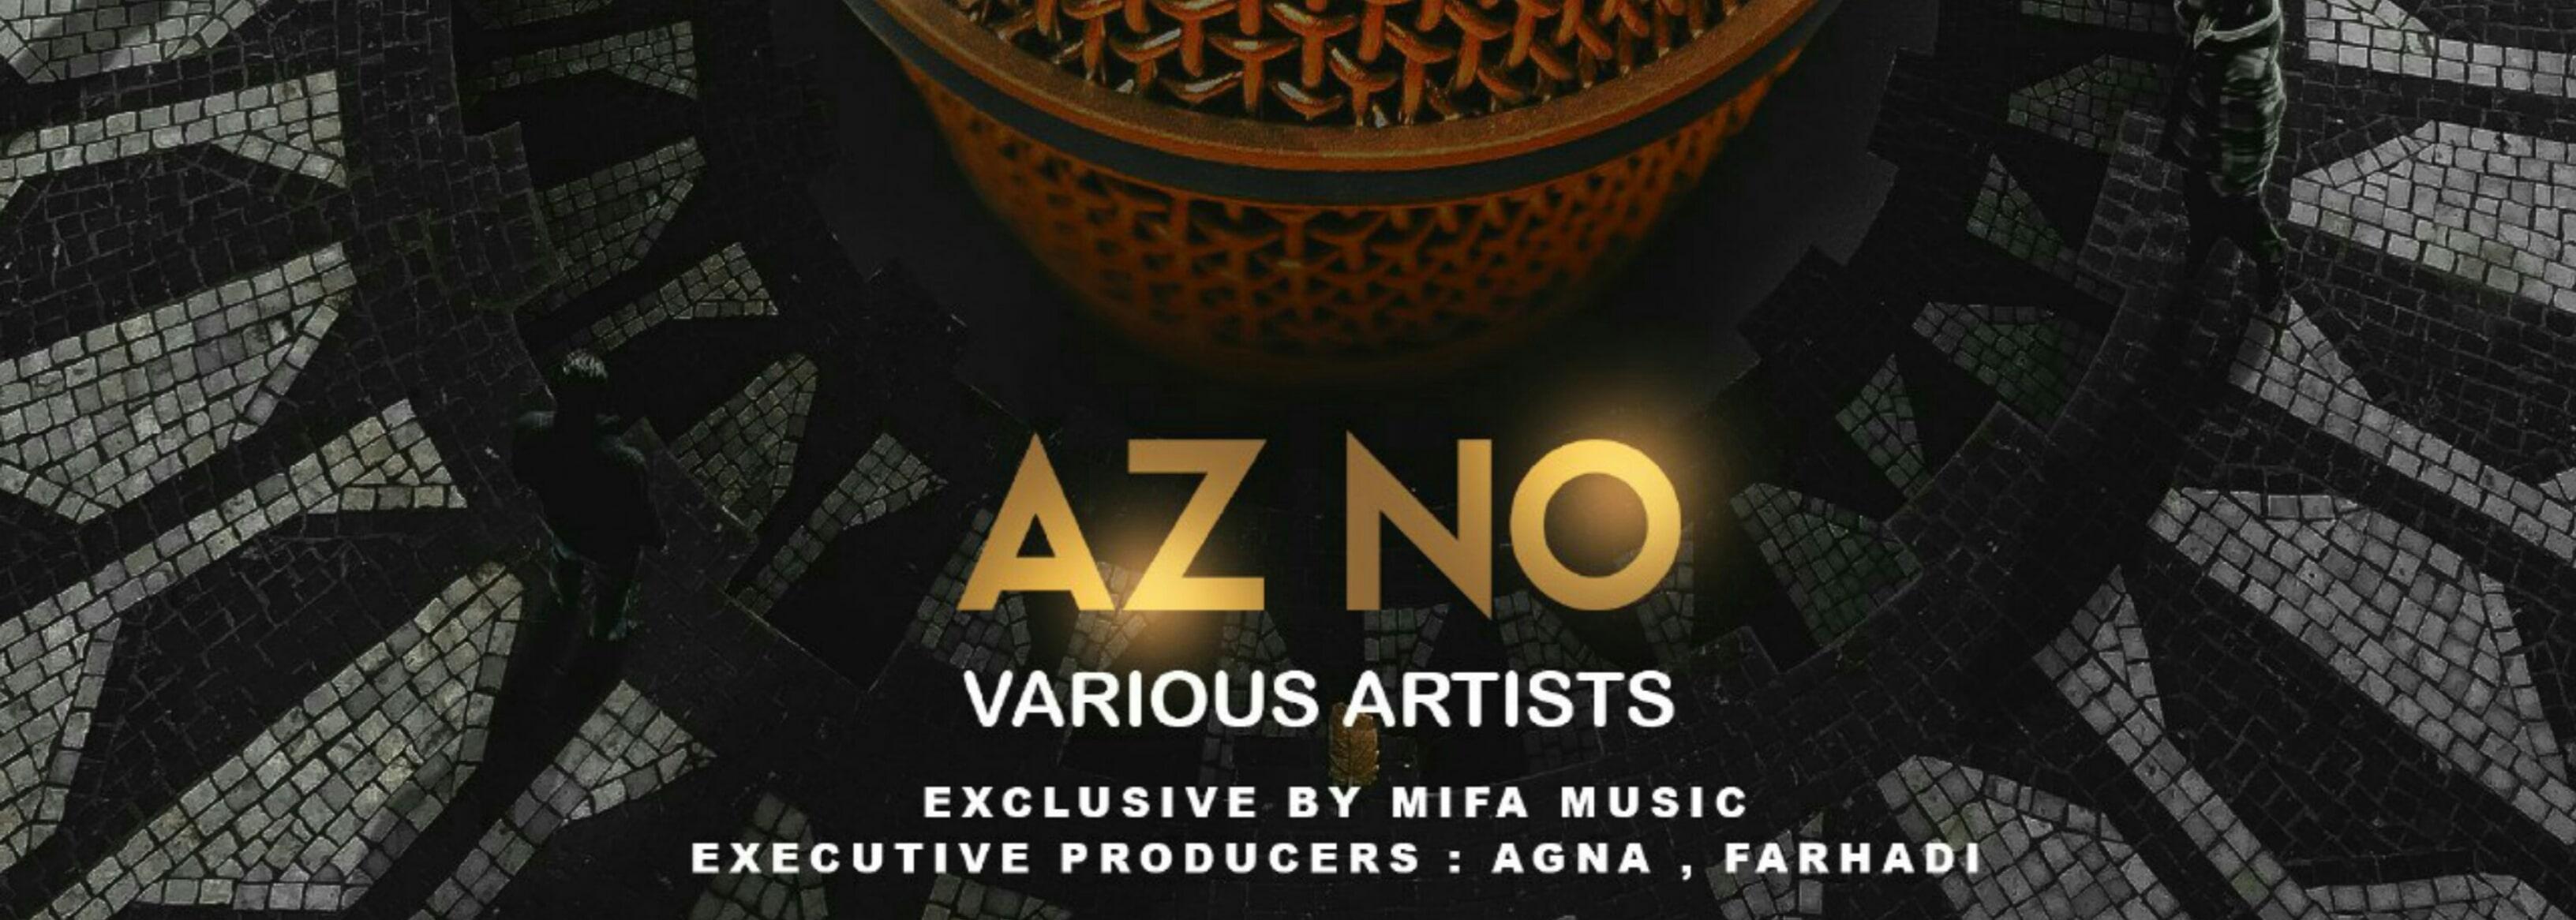 Various Artists Az No